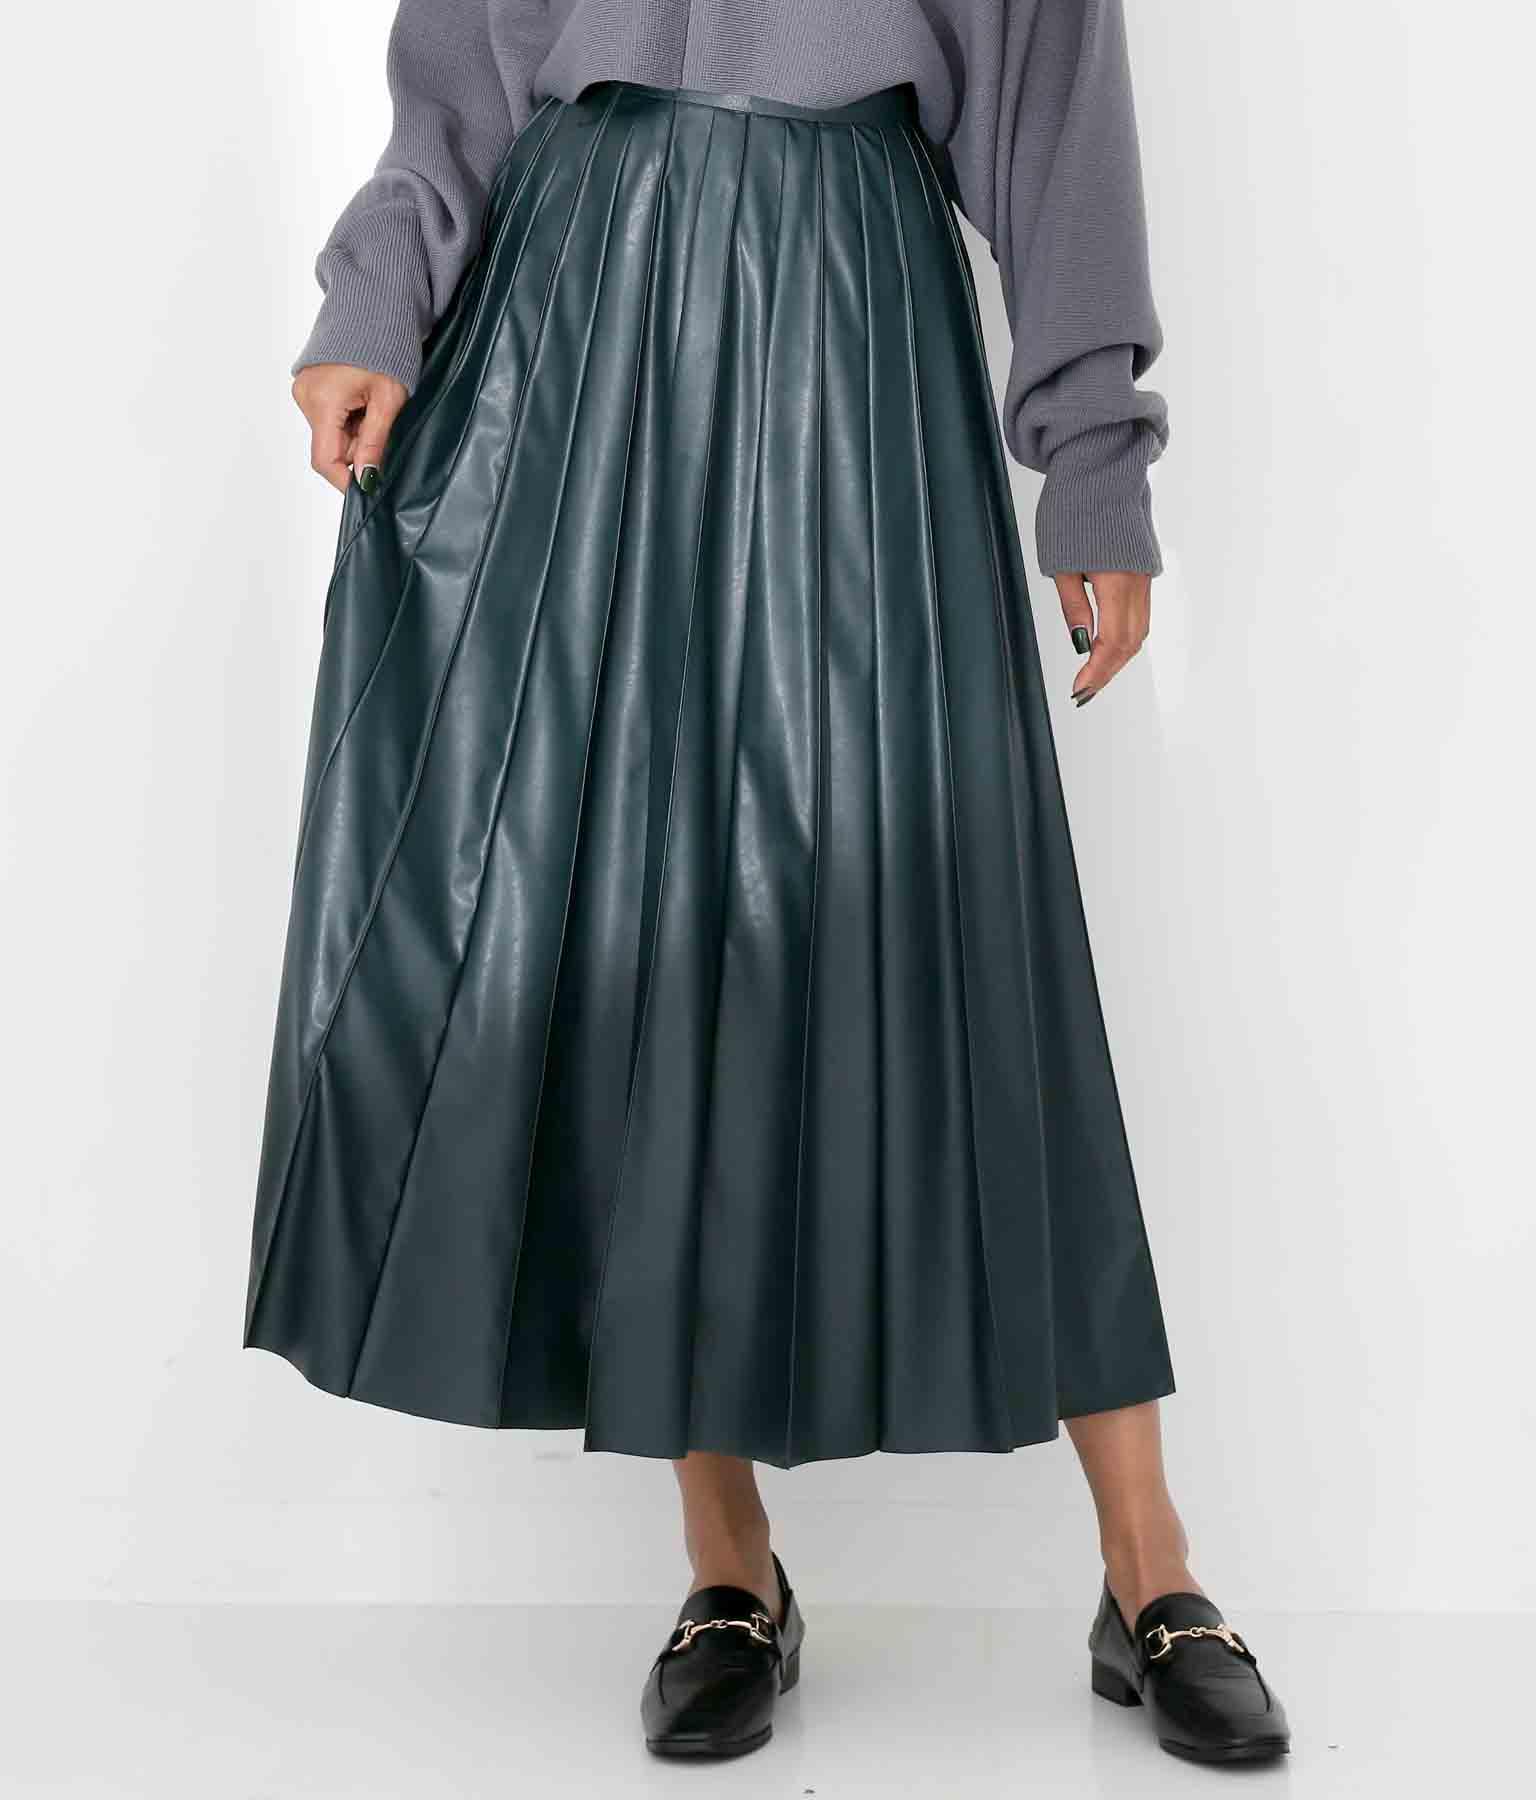 DONEEYUエコレザーピンタックロングスカート